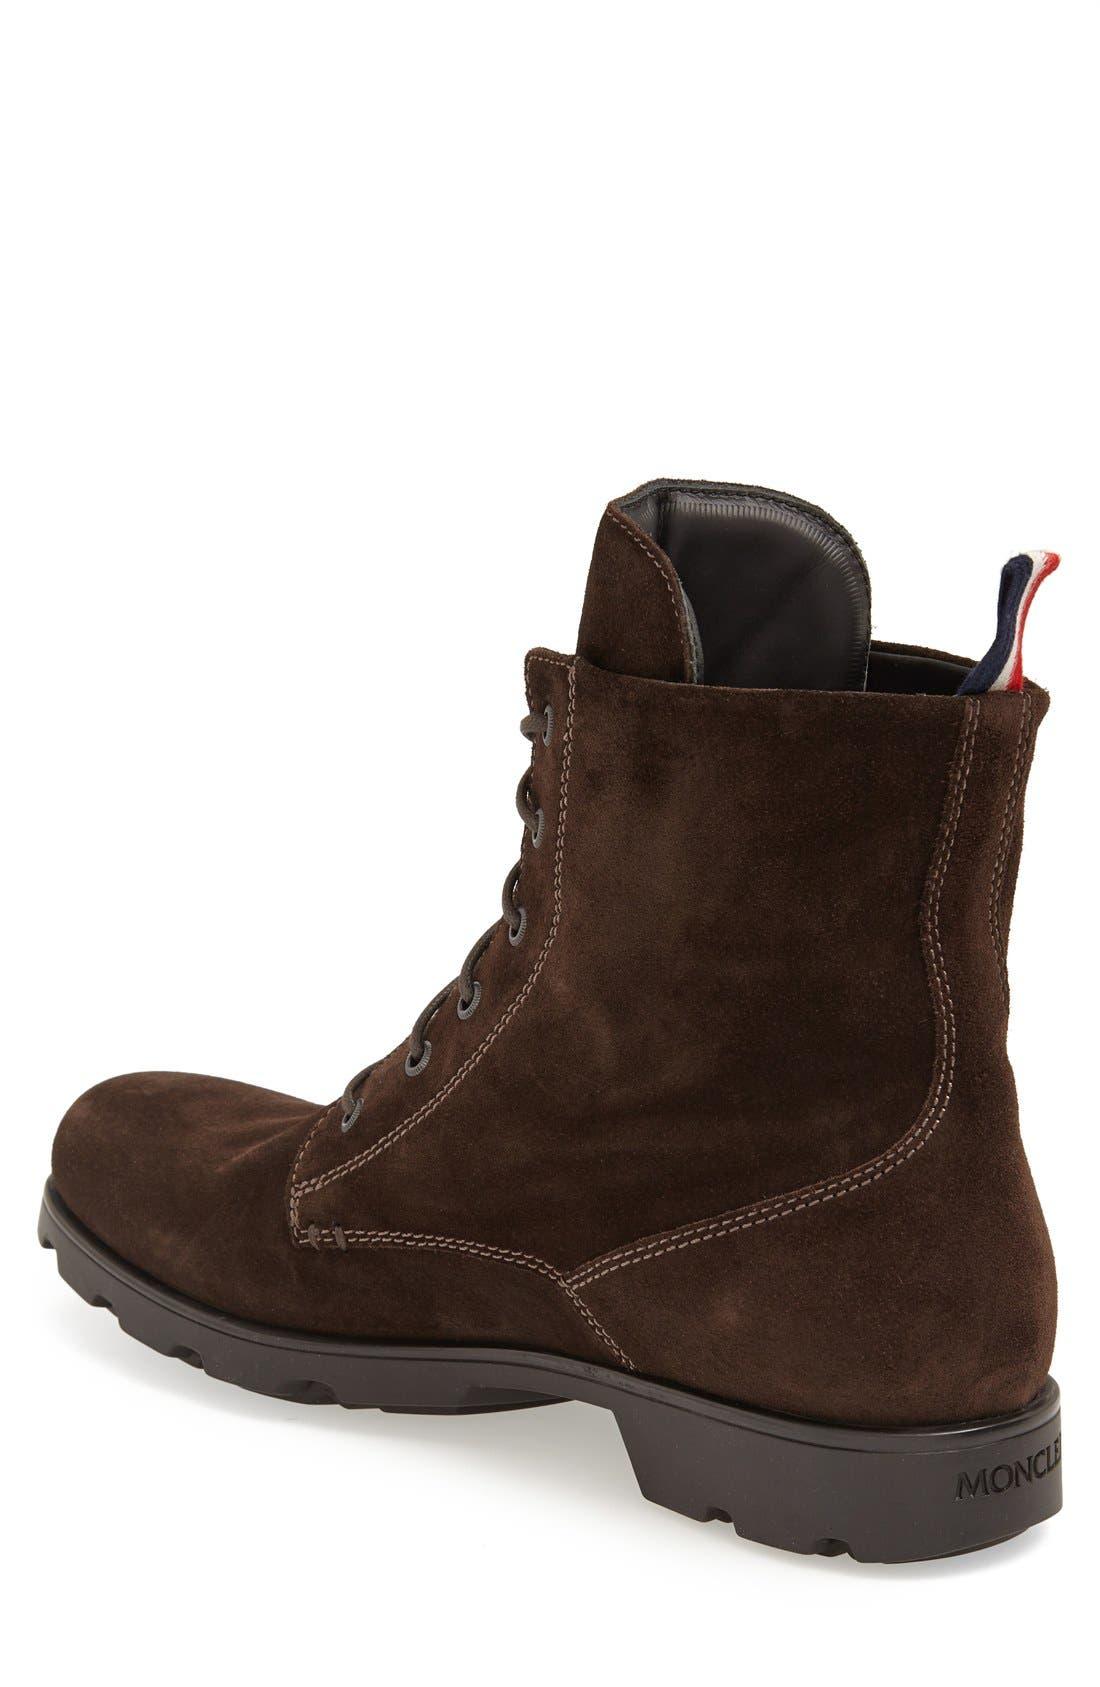 Alternate Image 2  - Moncler 'Vancouver' Plain Toe Boot (Men)